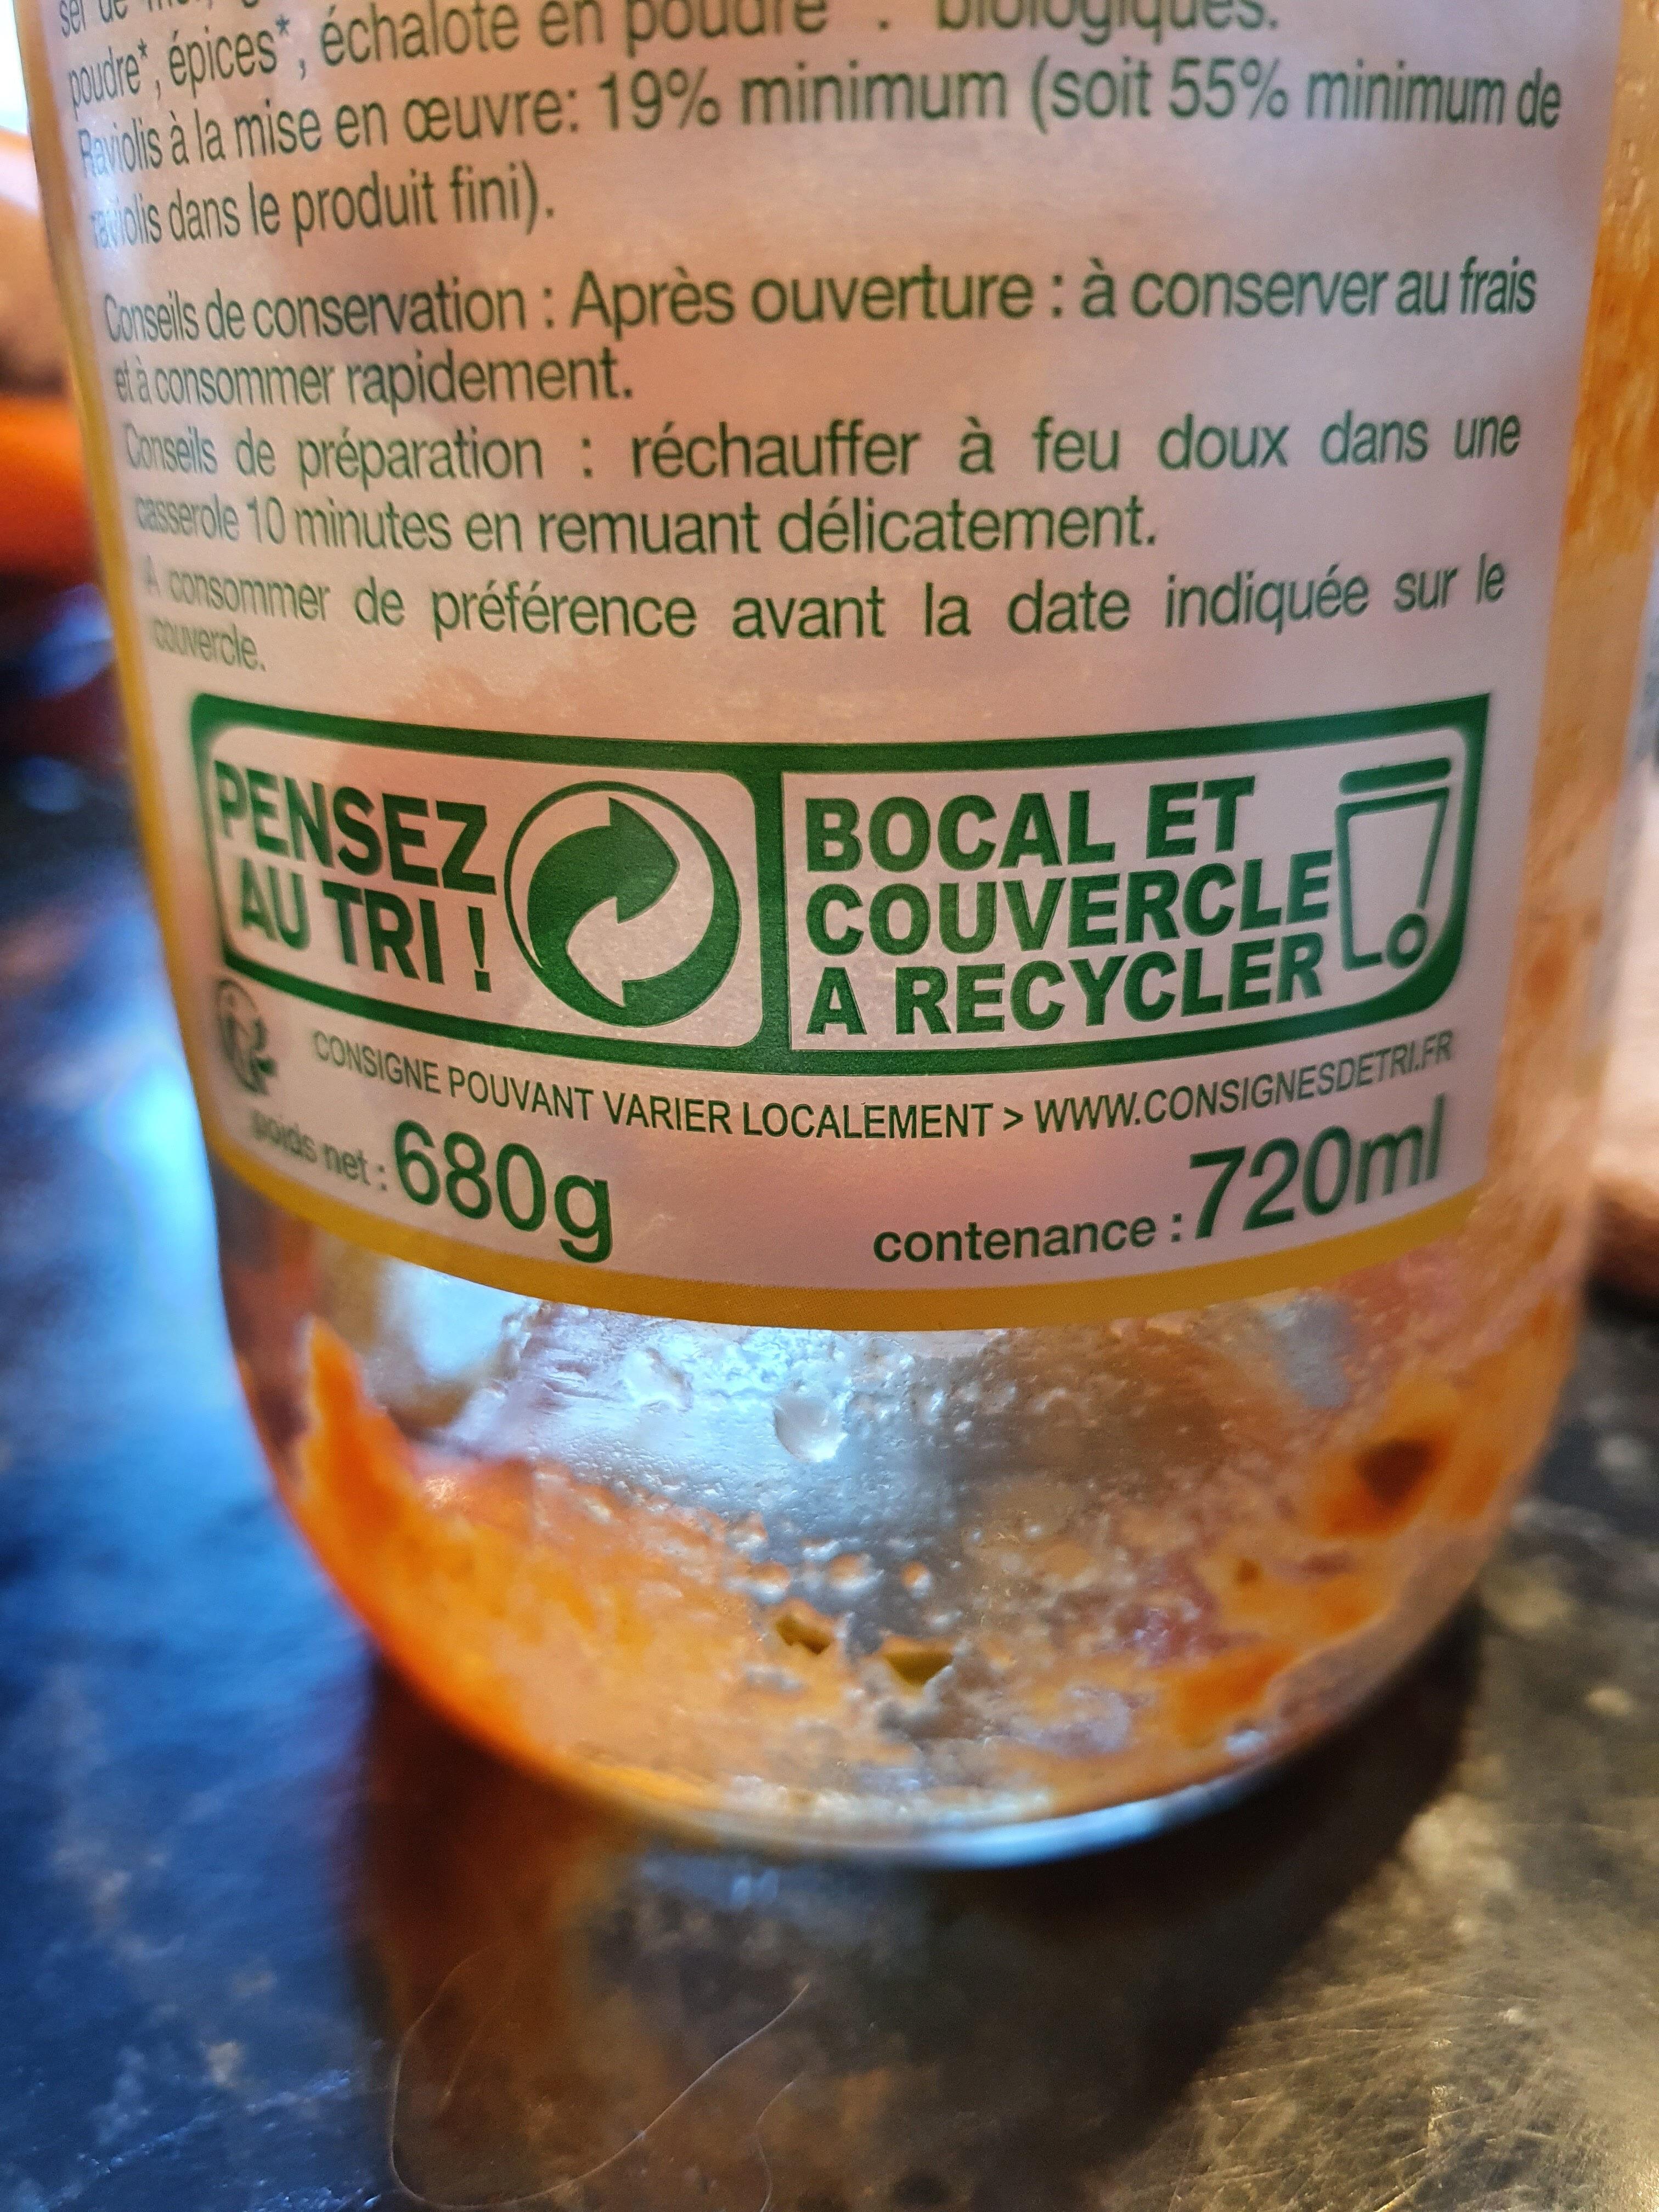 Raviolis végétariens - Recyclinginstructies en / of verpakkingsinformatie - fr